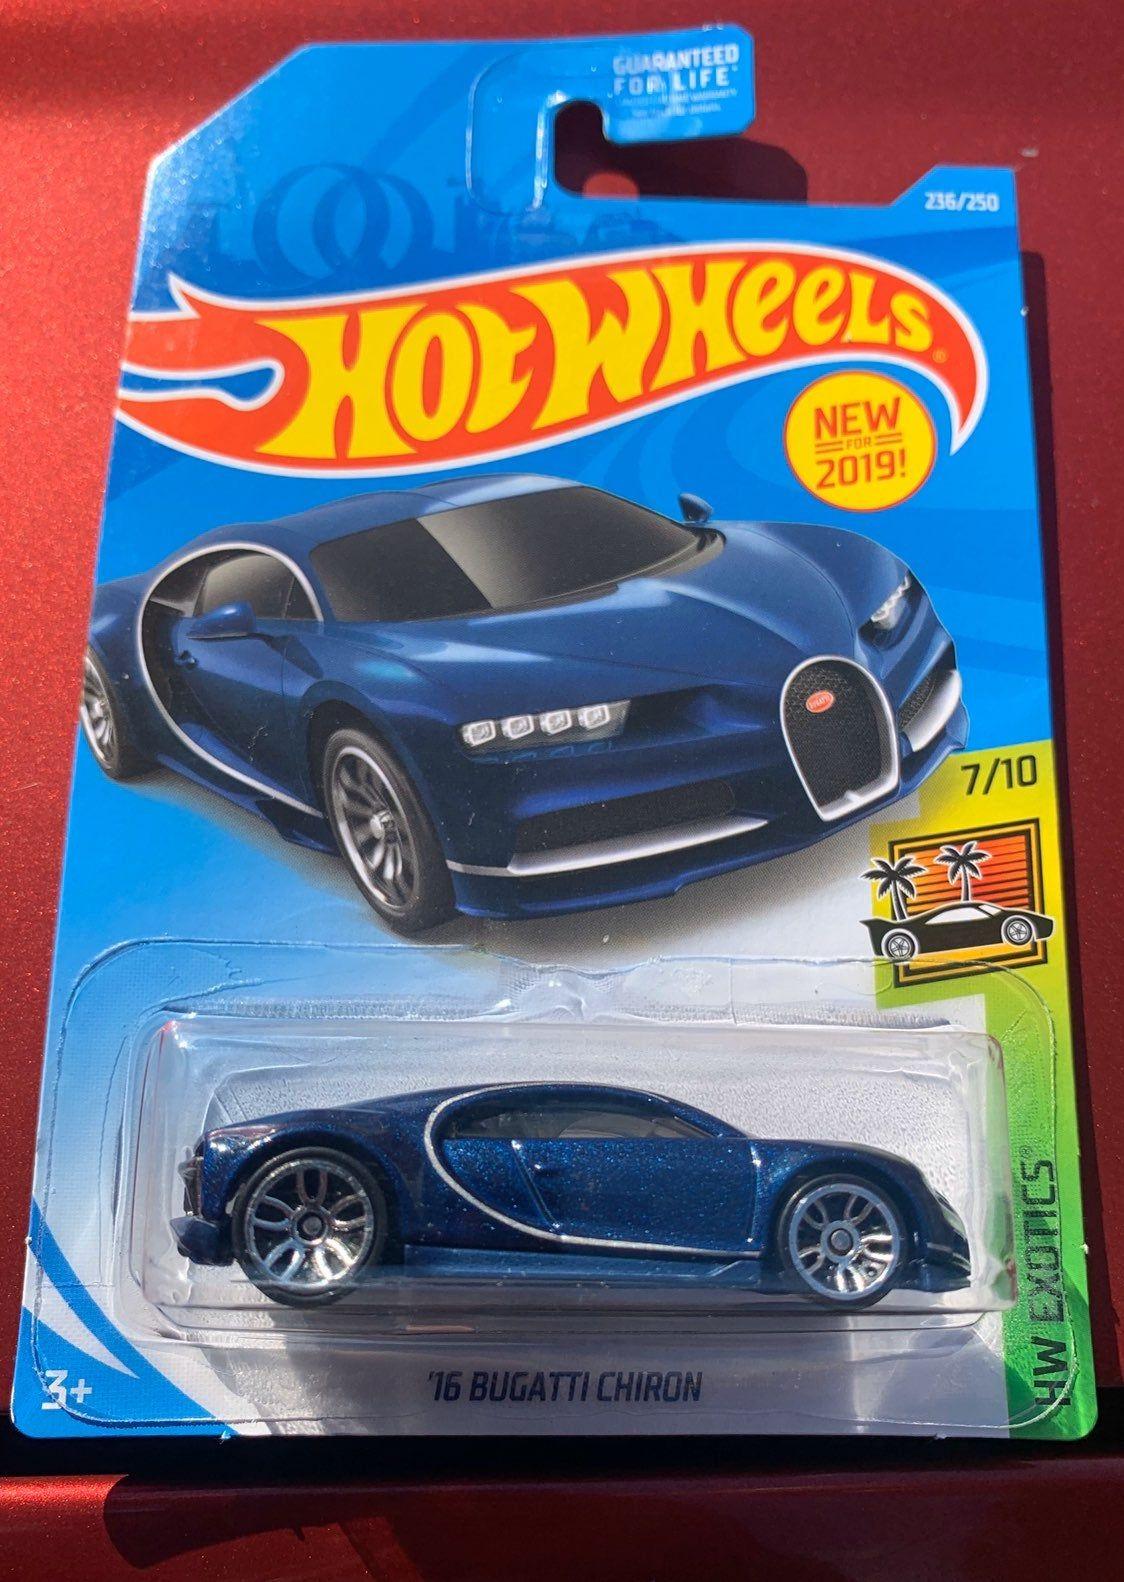 Hot Wheels Bugatti New For 2019 Brand New In Packaging Hot Wheels Cars Toys Hot Wheels Toys Hot Wheels Garage